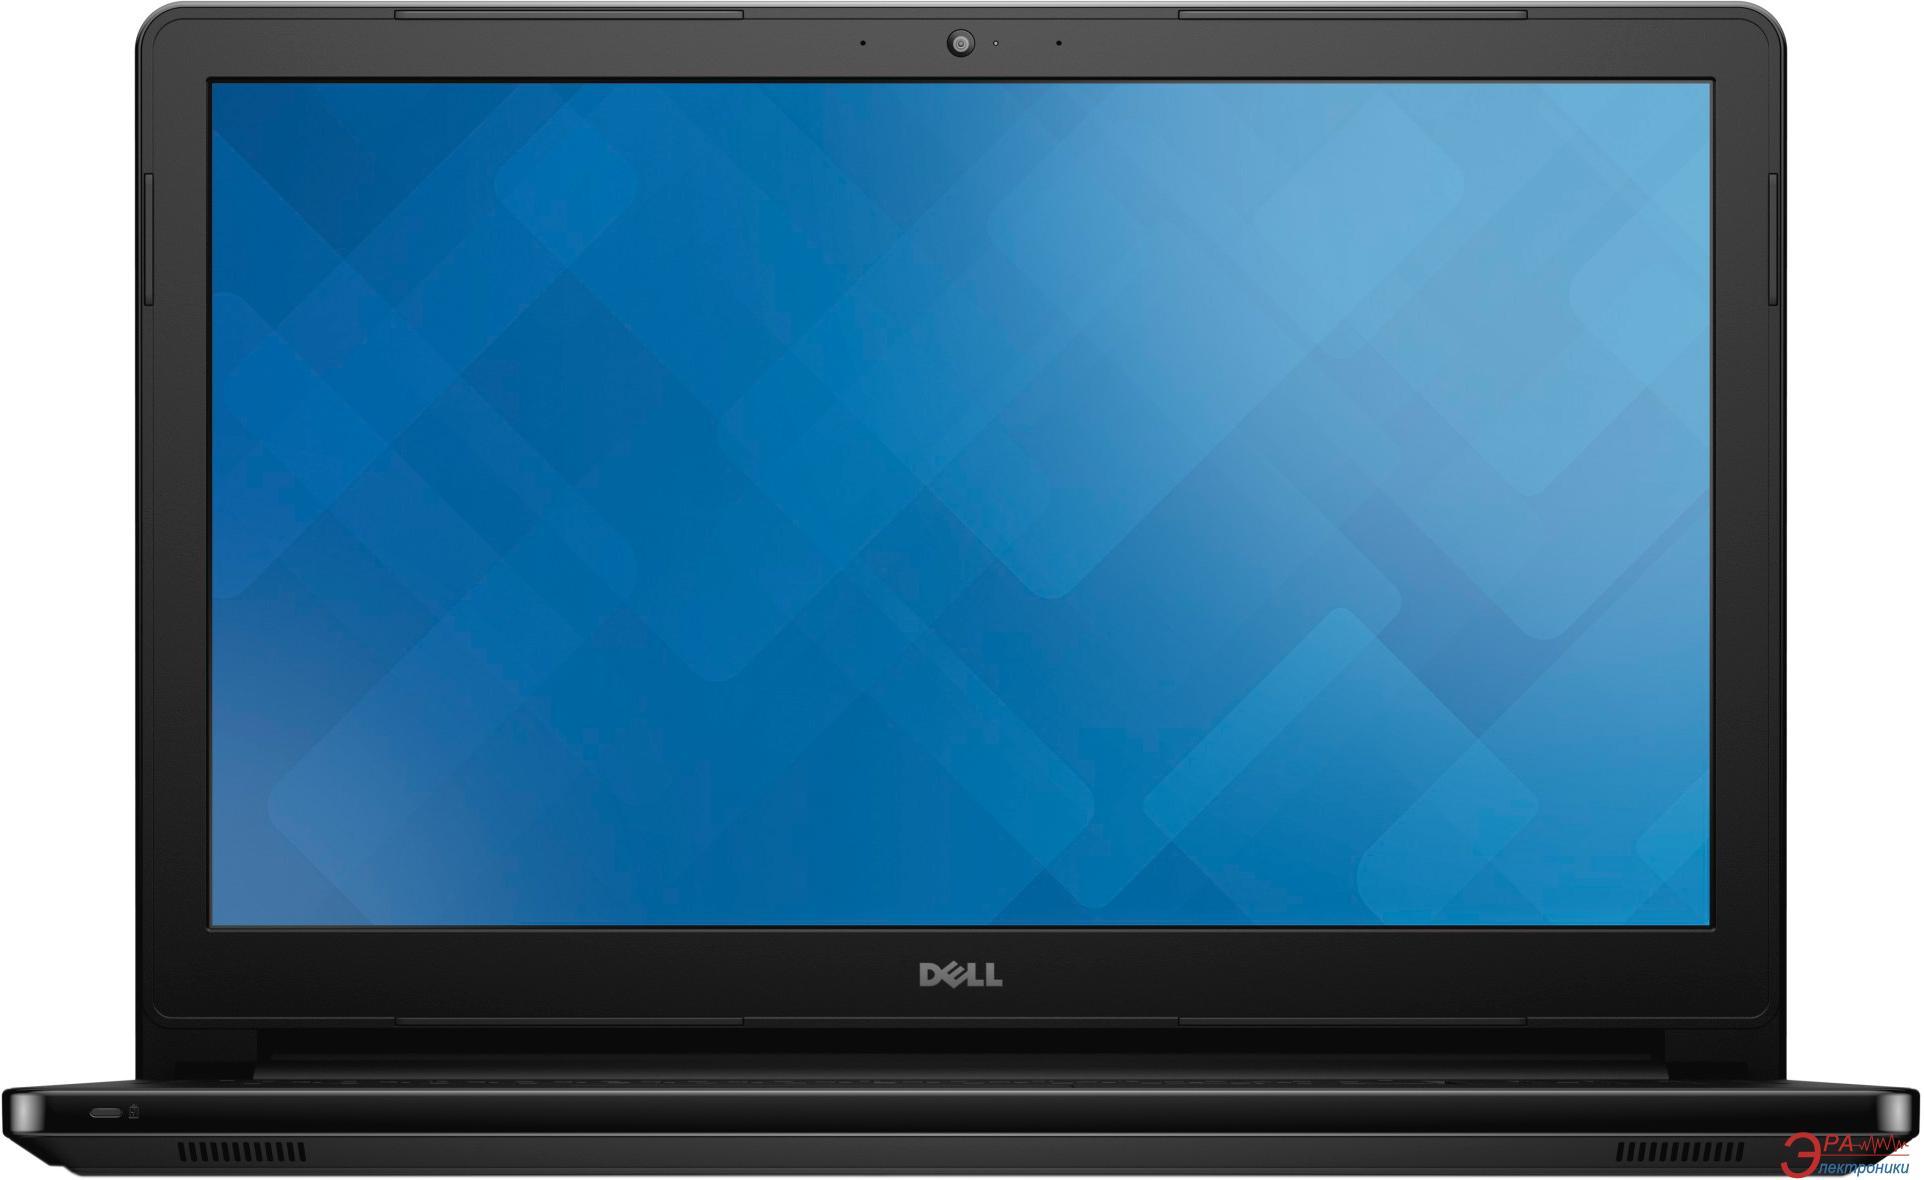 Ноутбук Dell Inspiron 5559 (I555410DDL-T2B) Blue 15,6